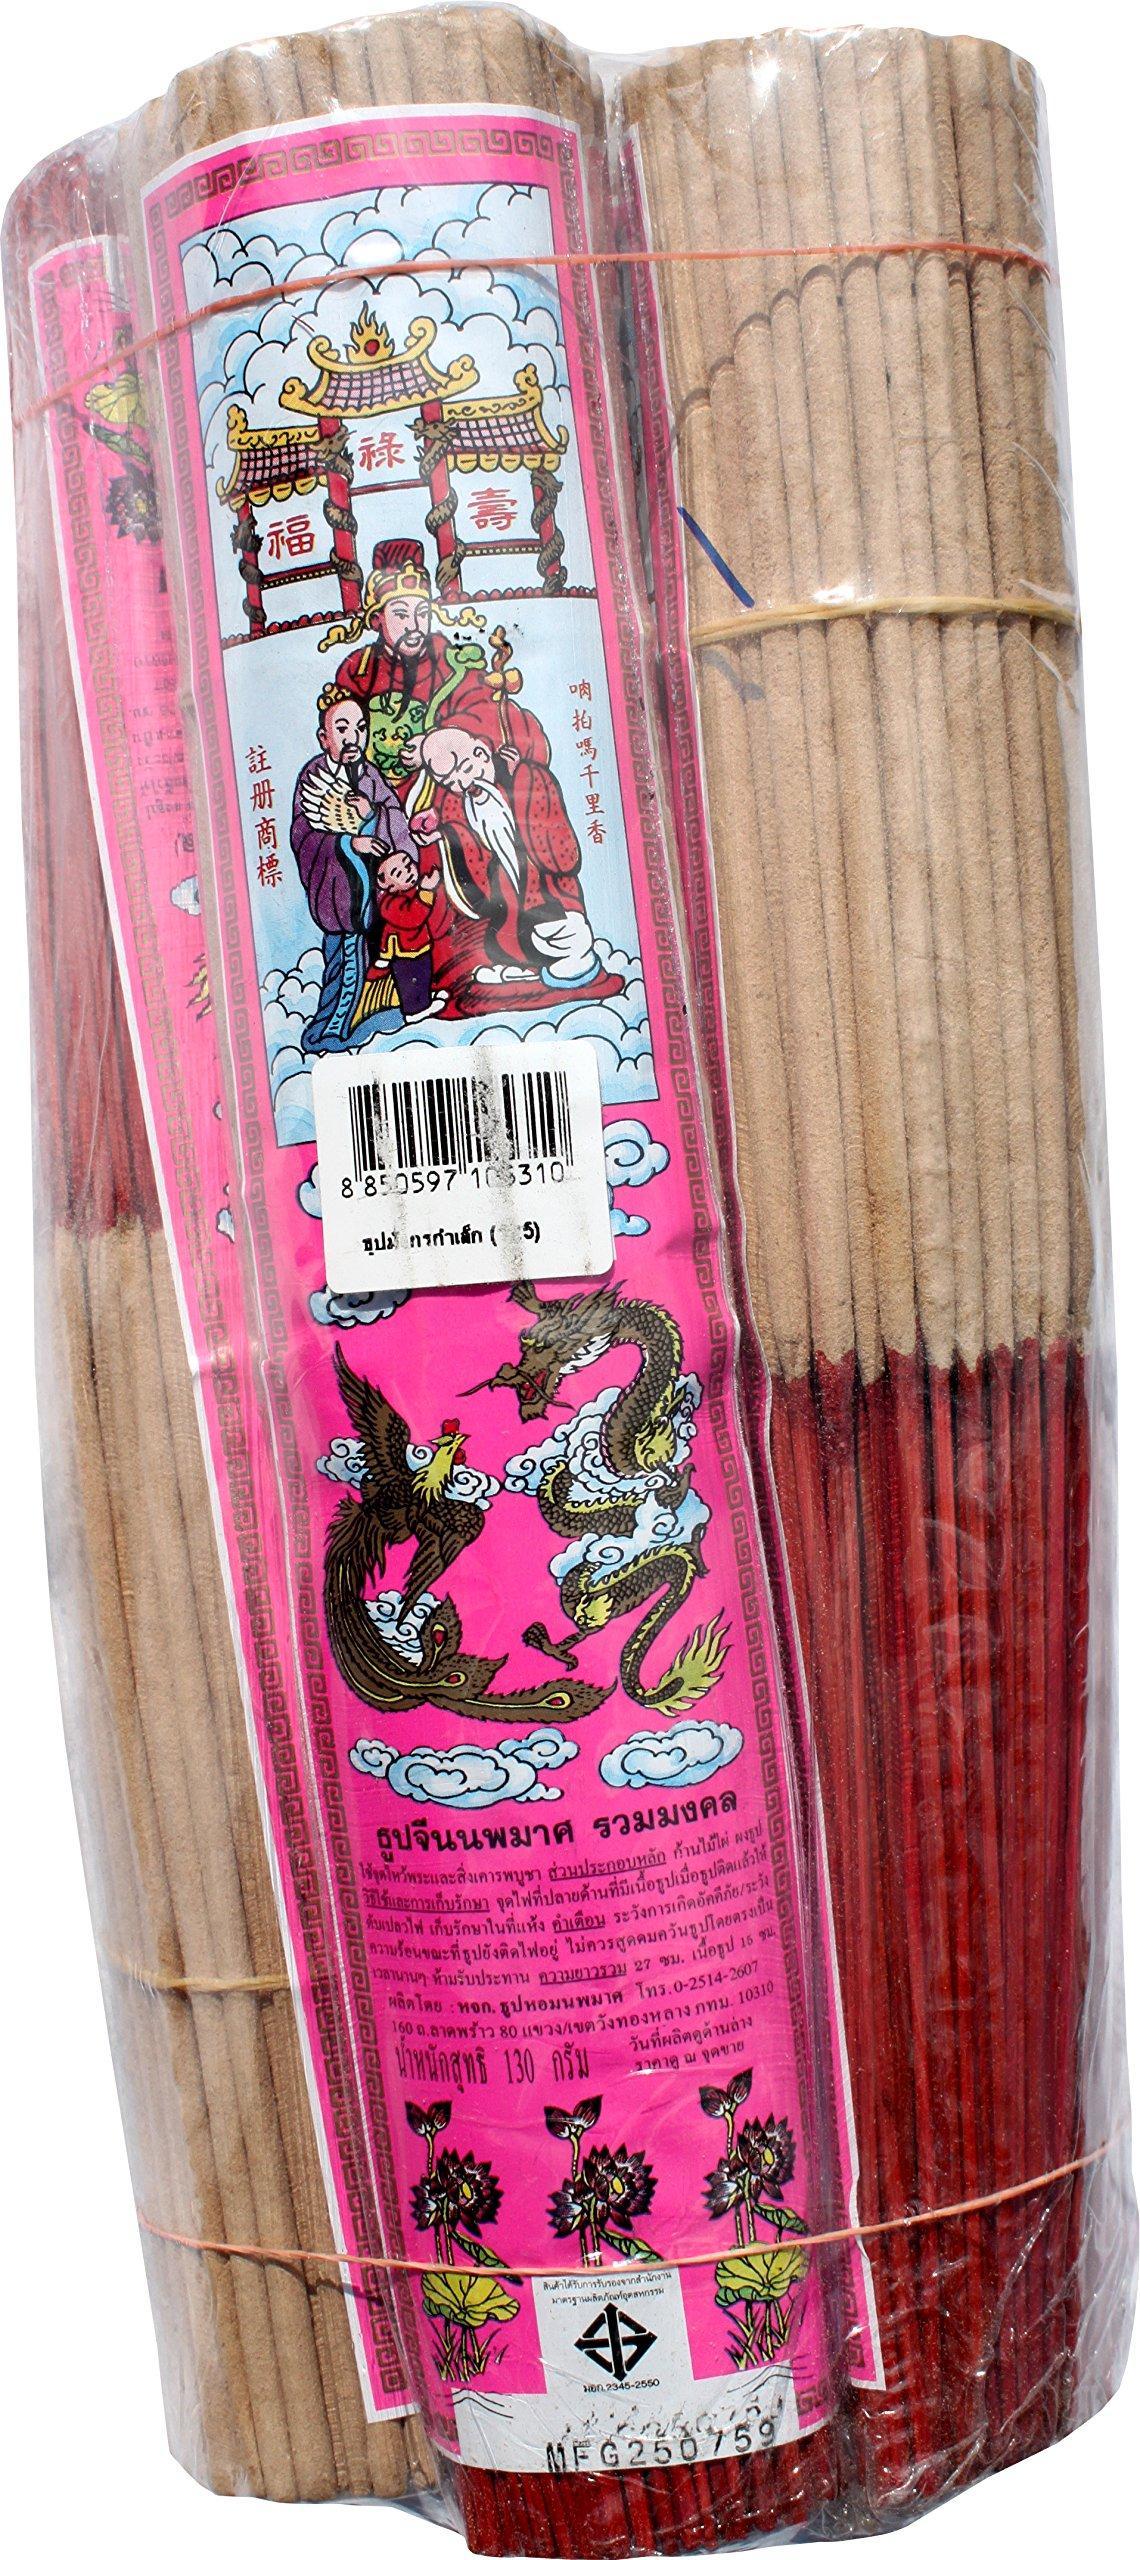 TupChineNokPamaad Brand Thai Bhuddhist Incense Joss Sticks 11'' x 650gm by TupChineNokPamaad